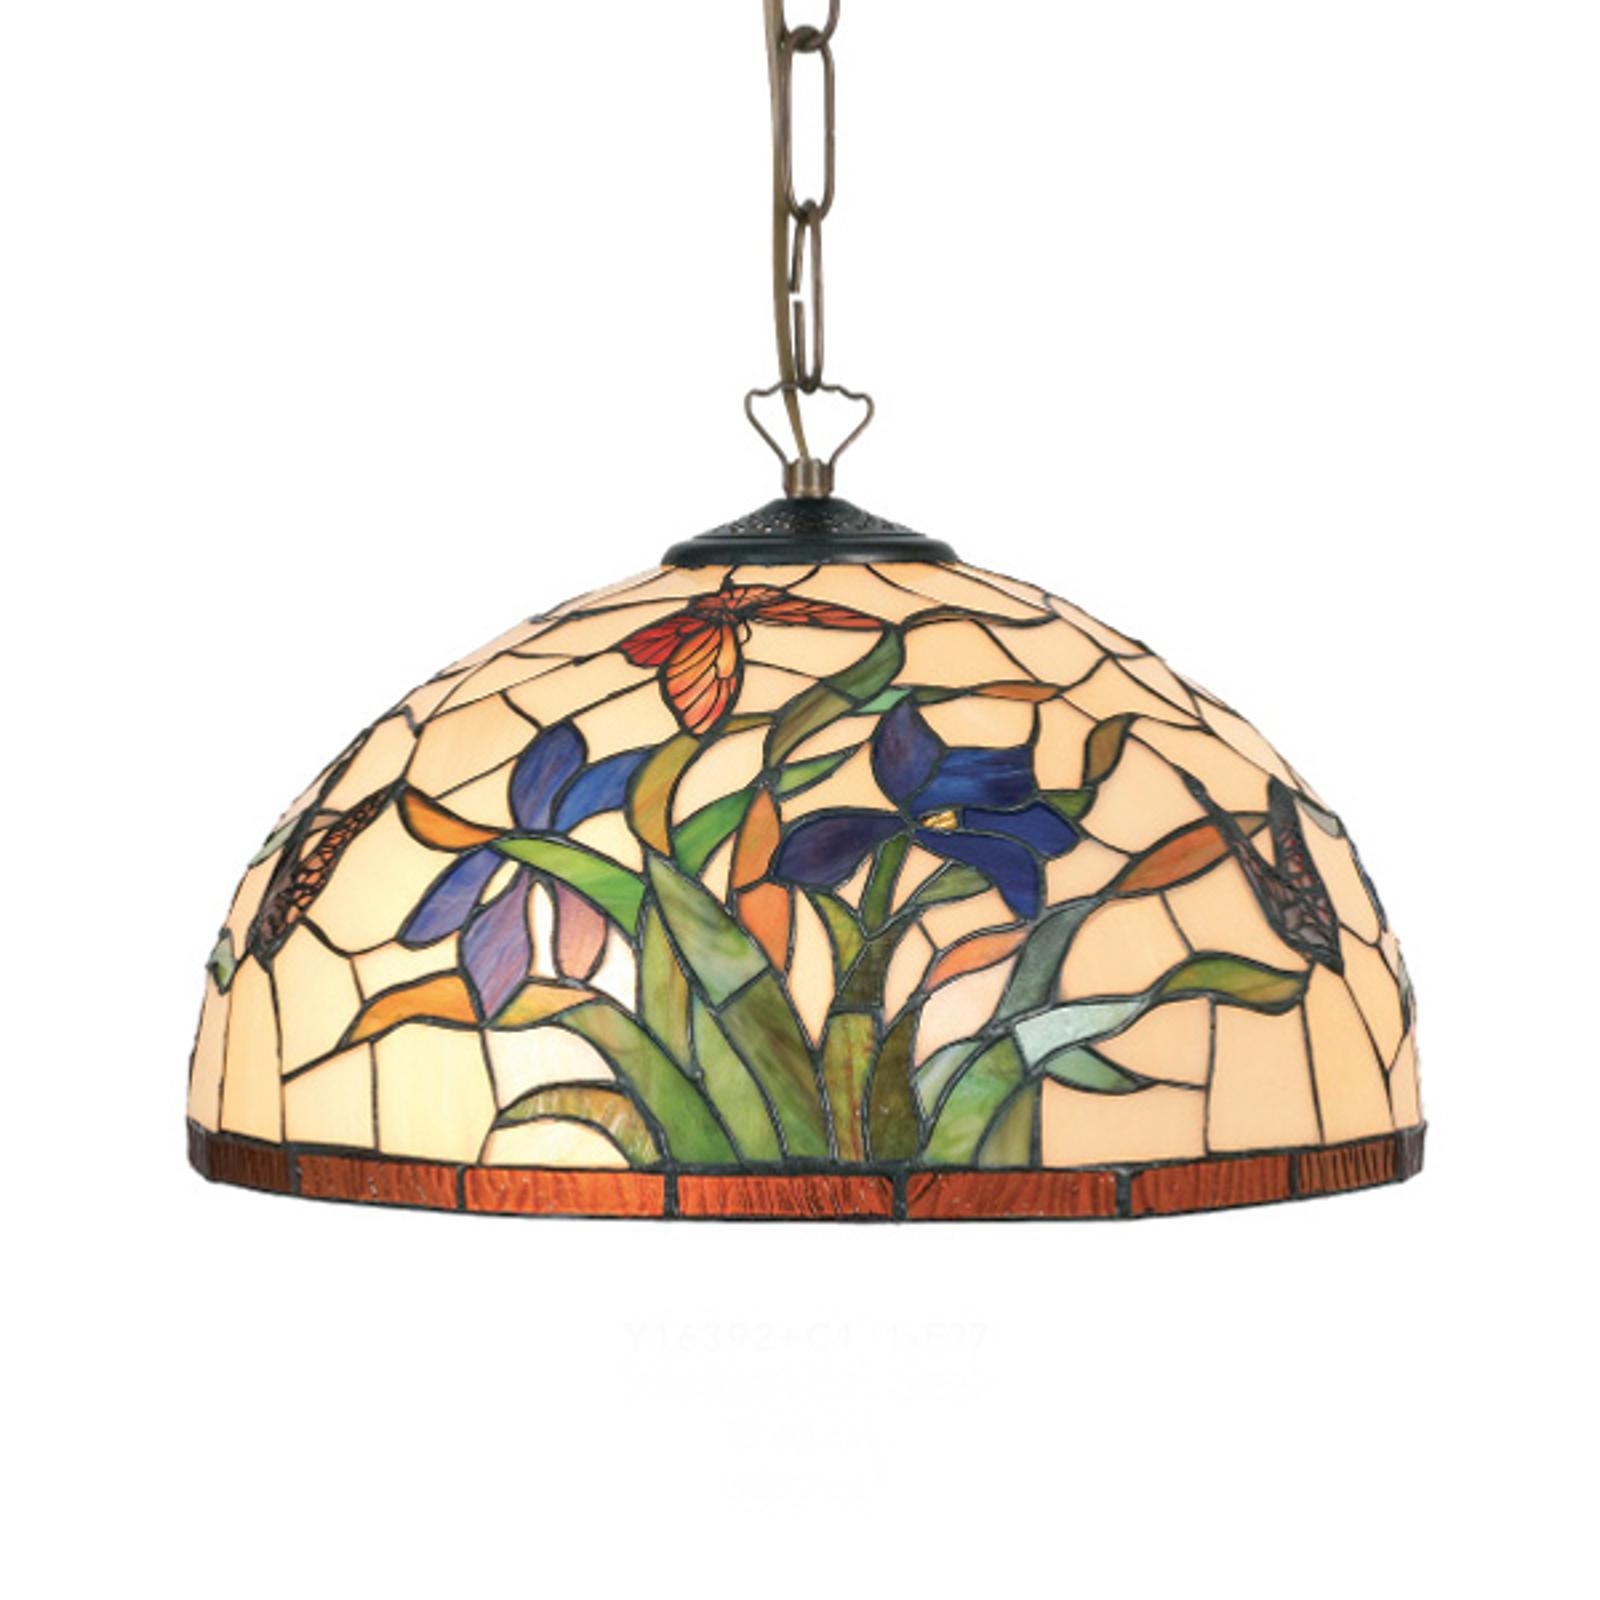 Elanda pendellampe i Tiffany-stil med to lys